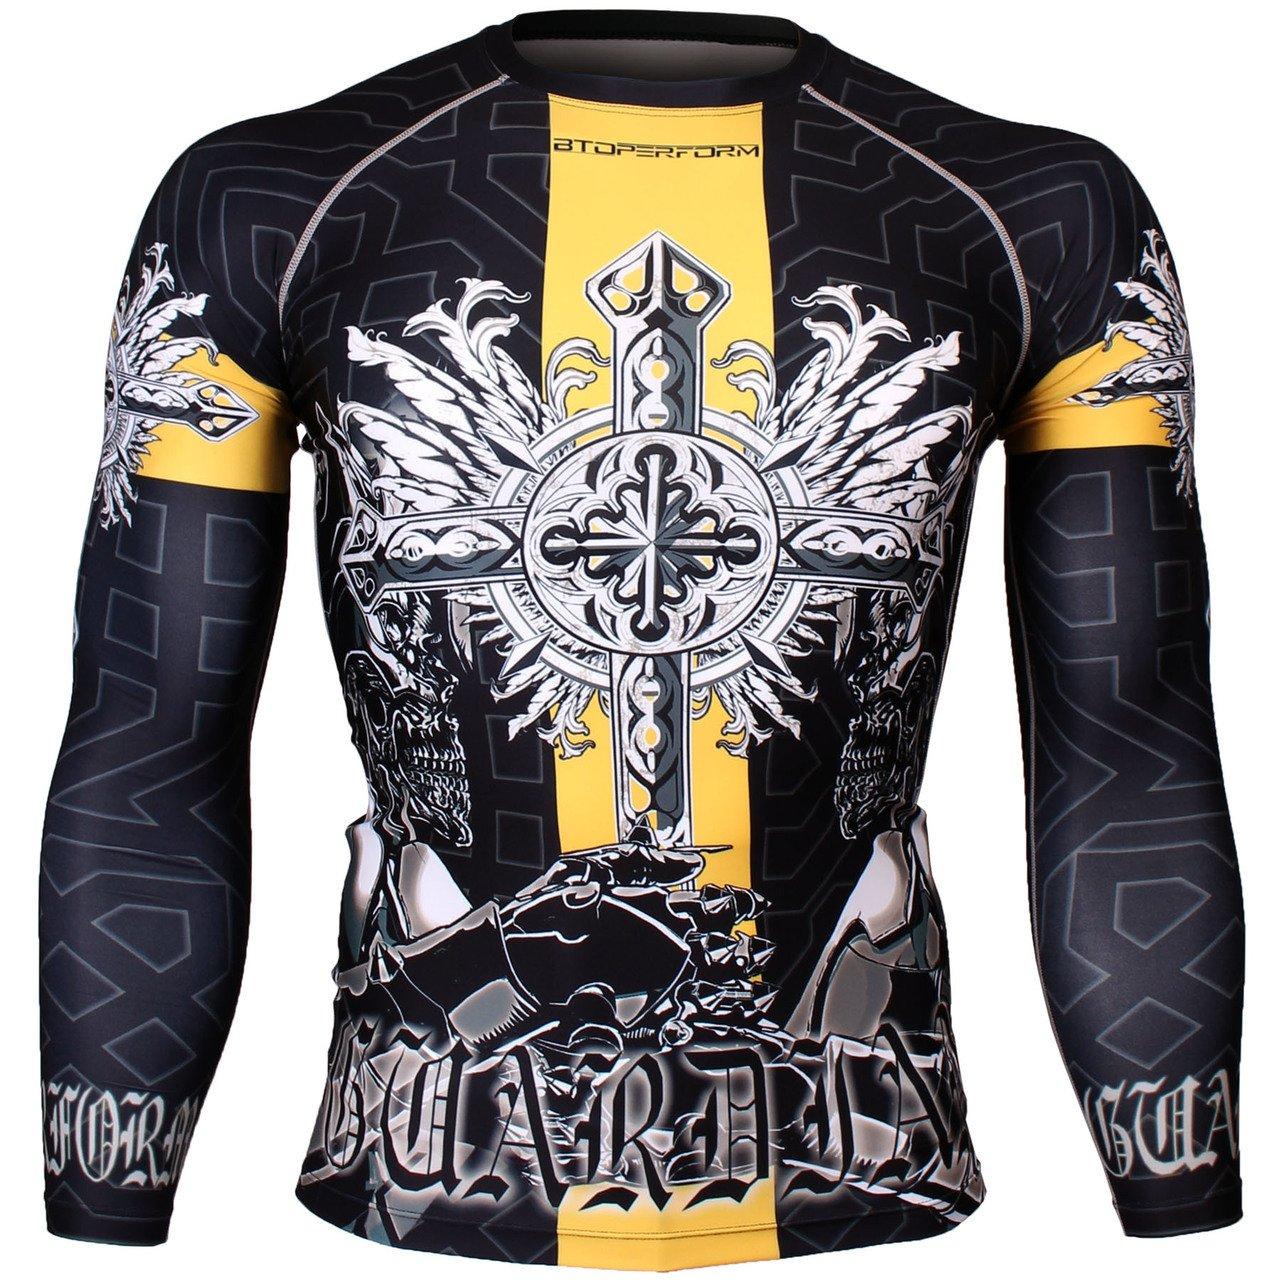 BTOPERFORM Compression shirt Base Layer Under Skin Tight Rash guard MMA Gym S-1